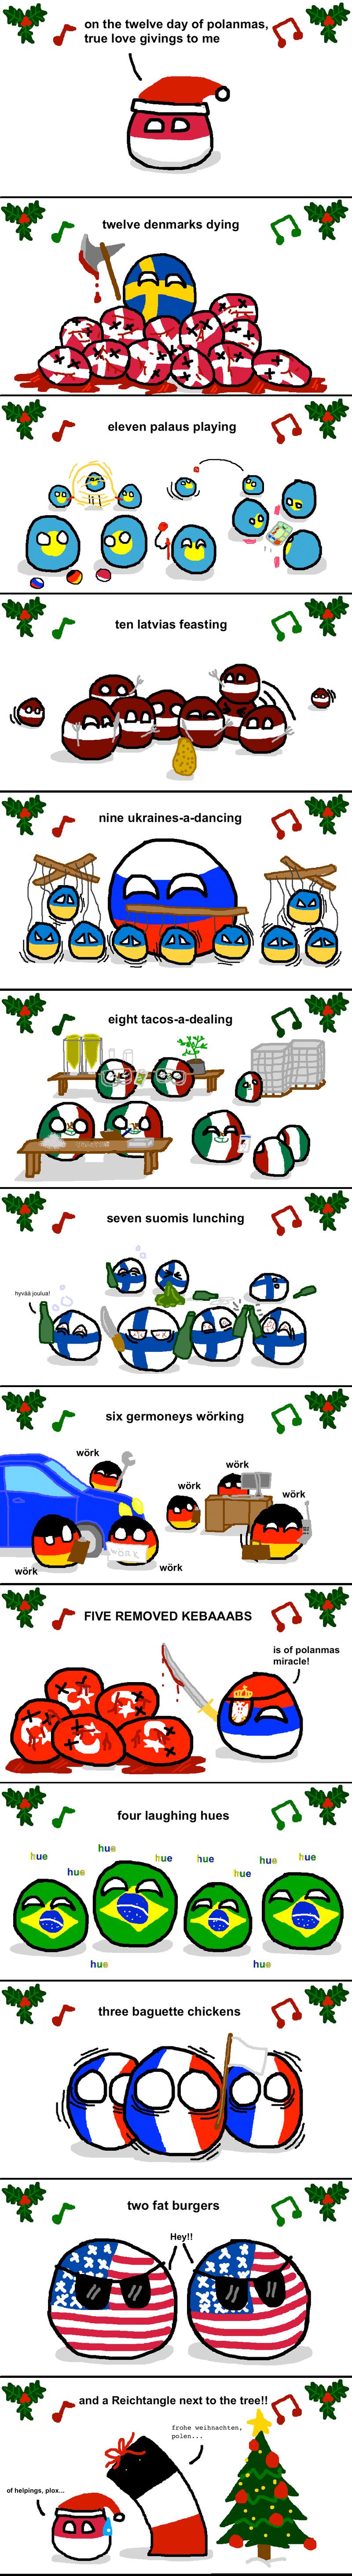 Daily Polandball: Holiday Music.